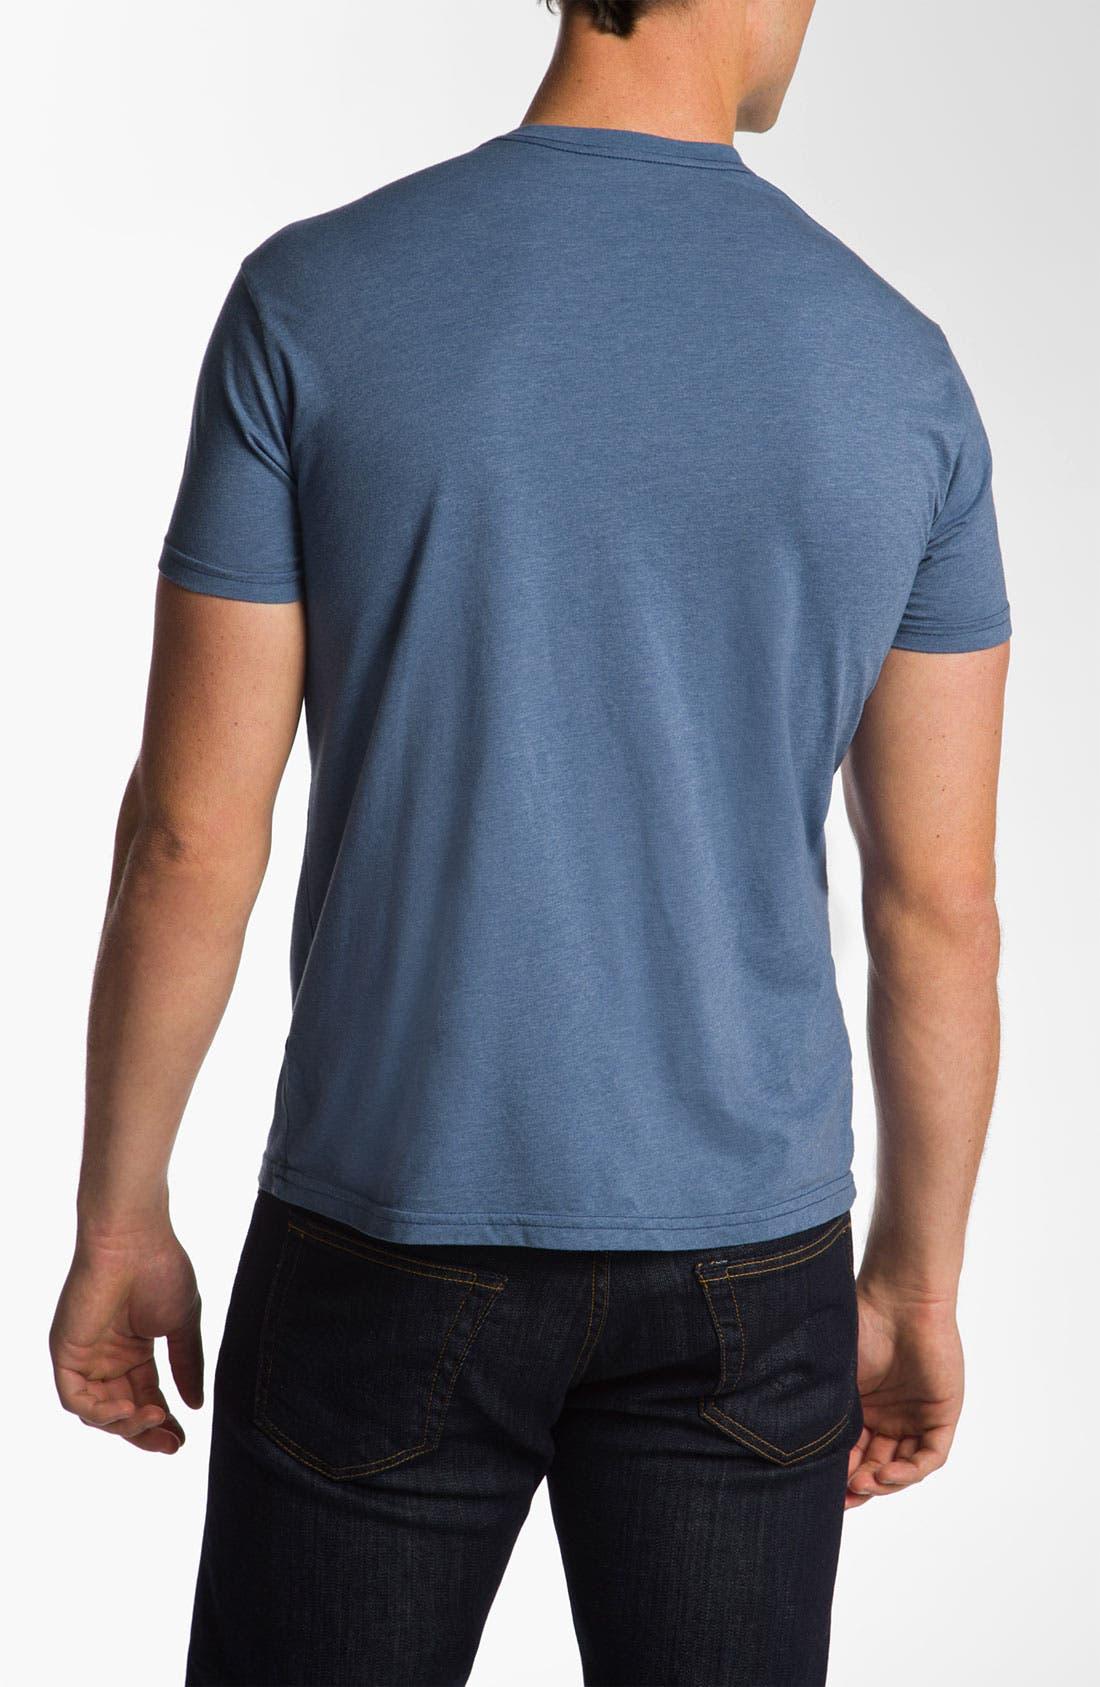 Alternate Image 2  - The Original Retro Brand 'University of Kansas Jayhawks' T-Shirt